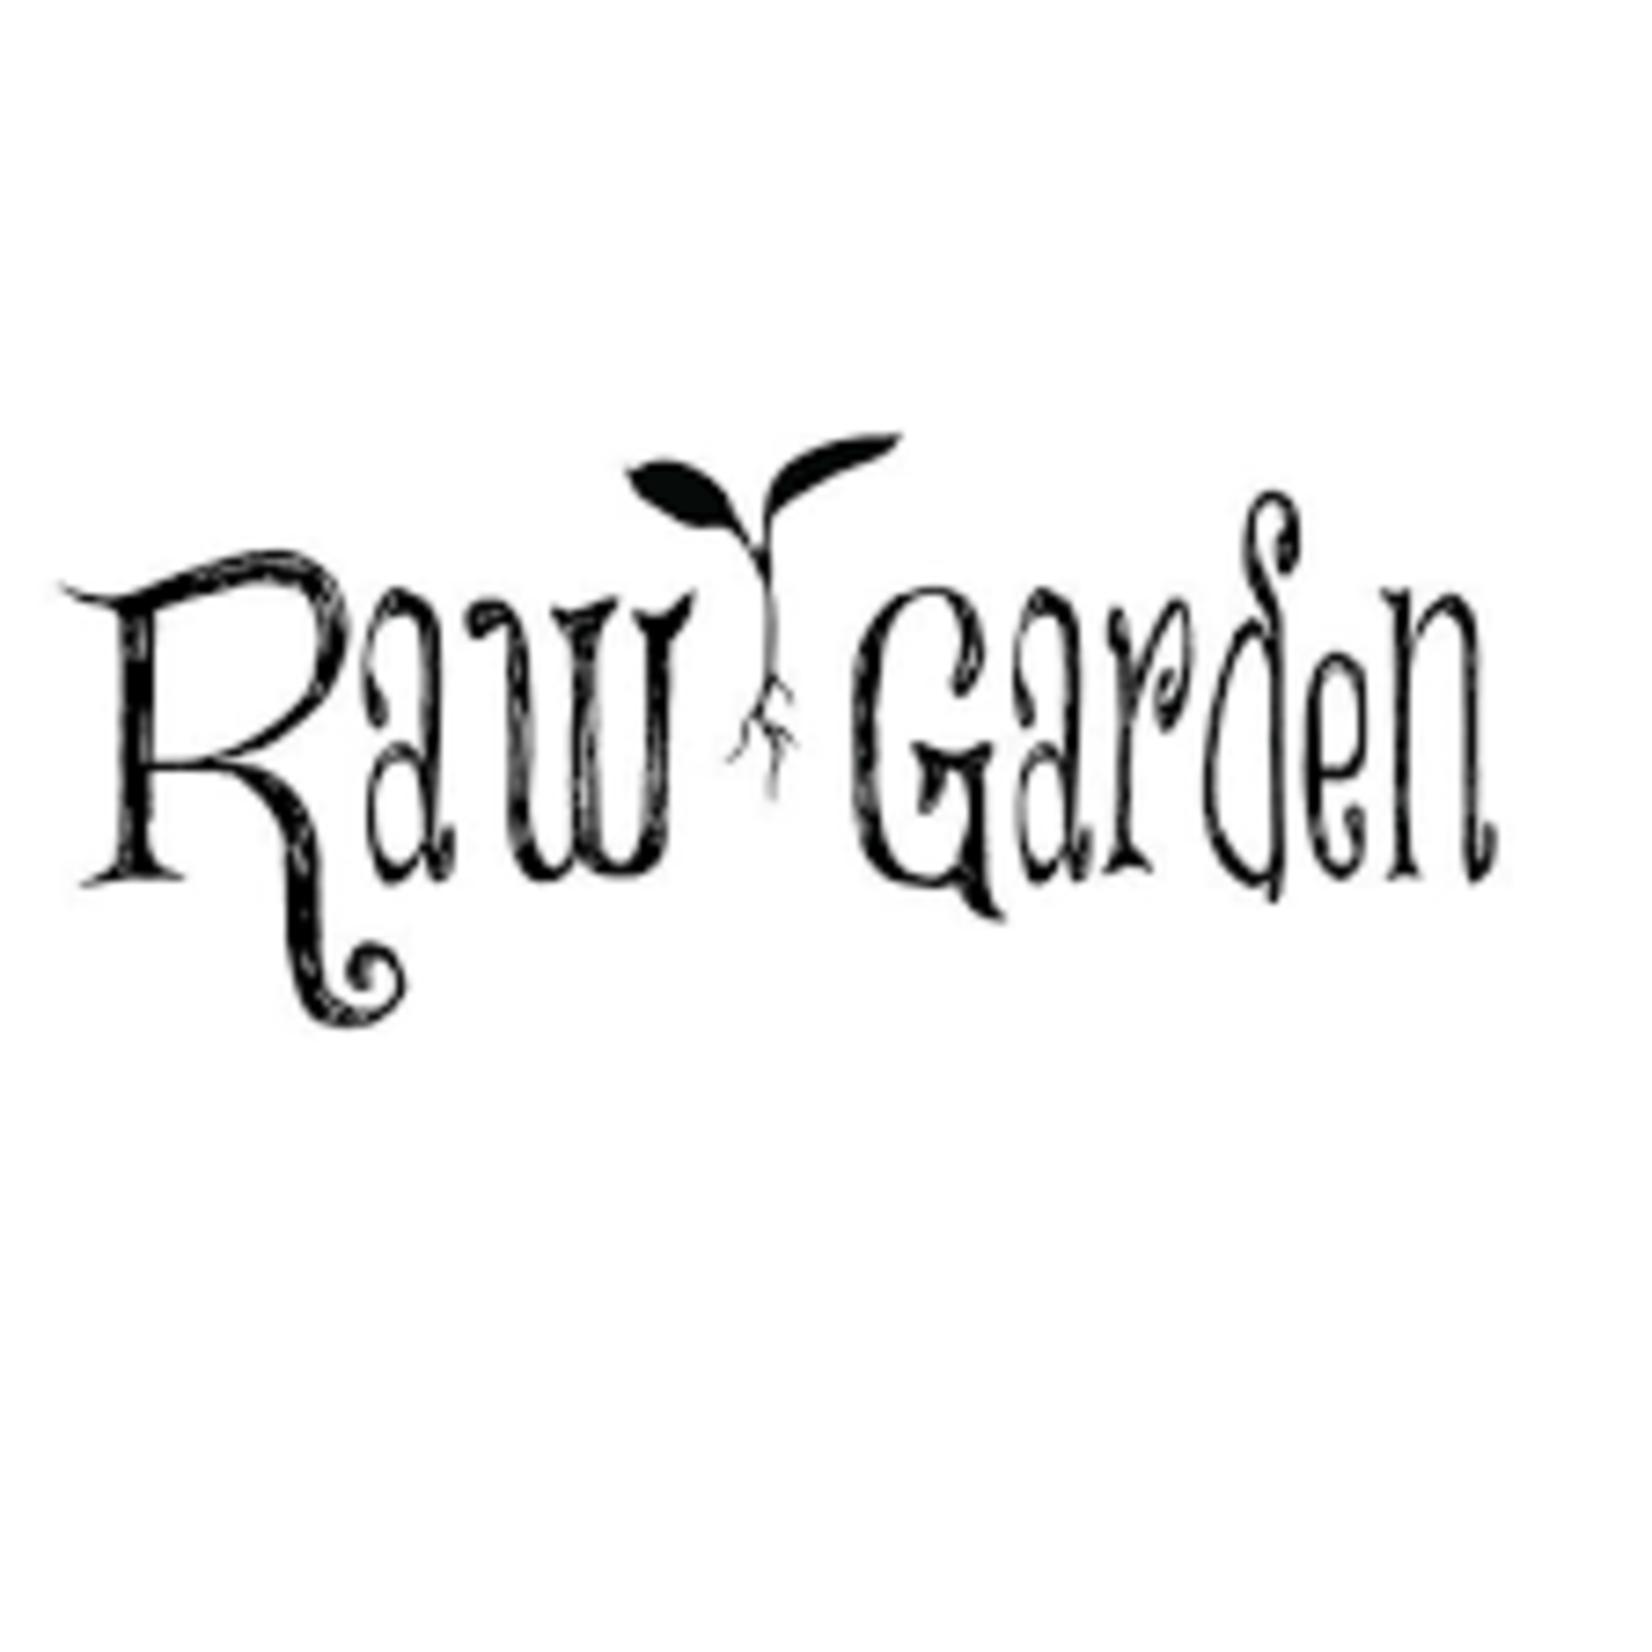 Raw Garden / Punch Walker